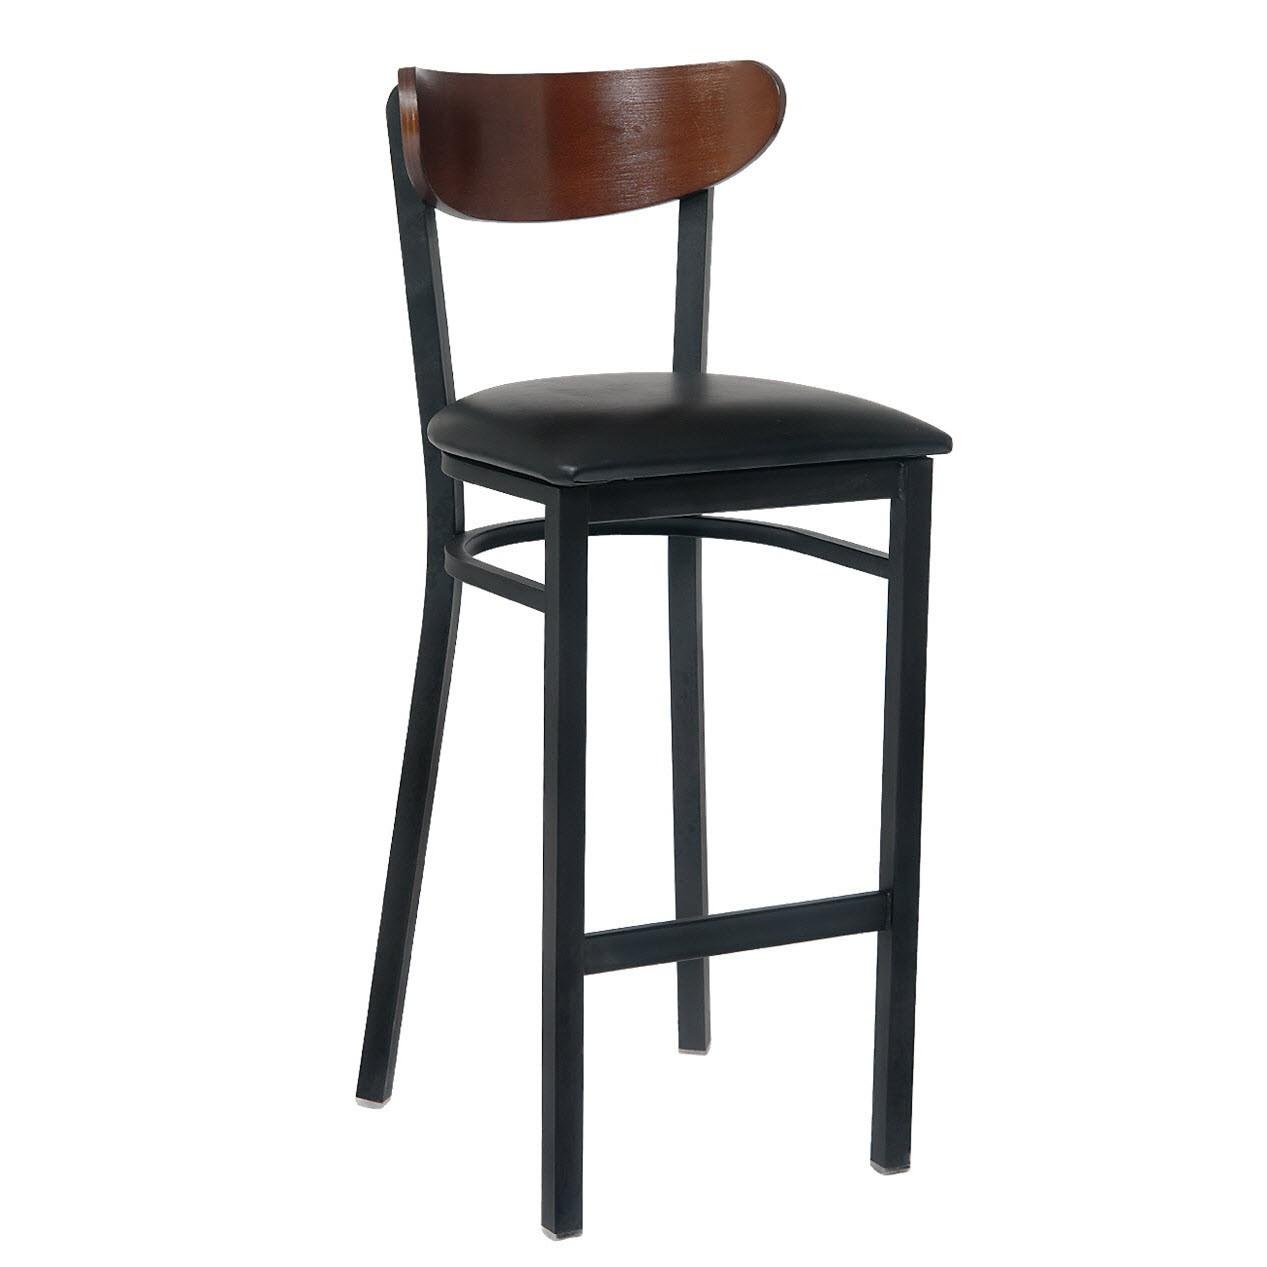 Enjoyable Walnut Moon Back Metal Bar Stool With Veneer Seat Creativecarmelina Interior Chair Design Creativecarmelinacom